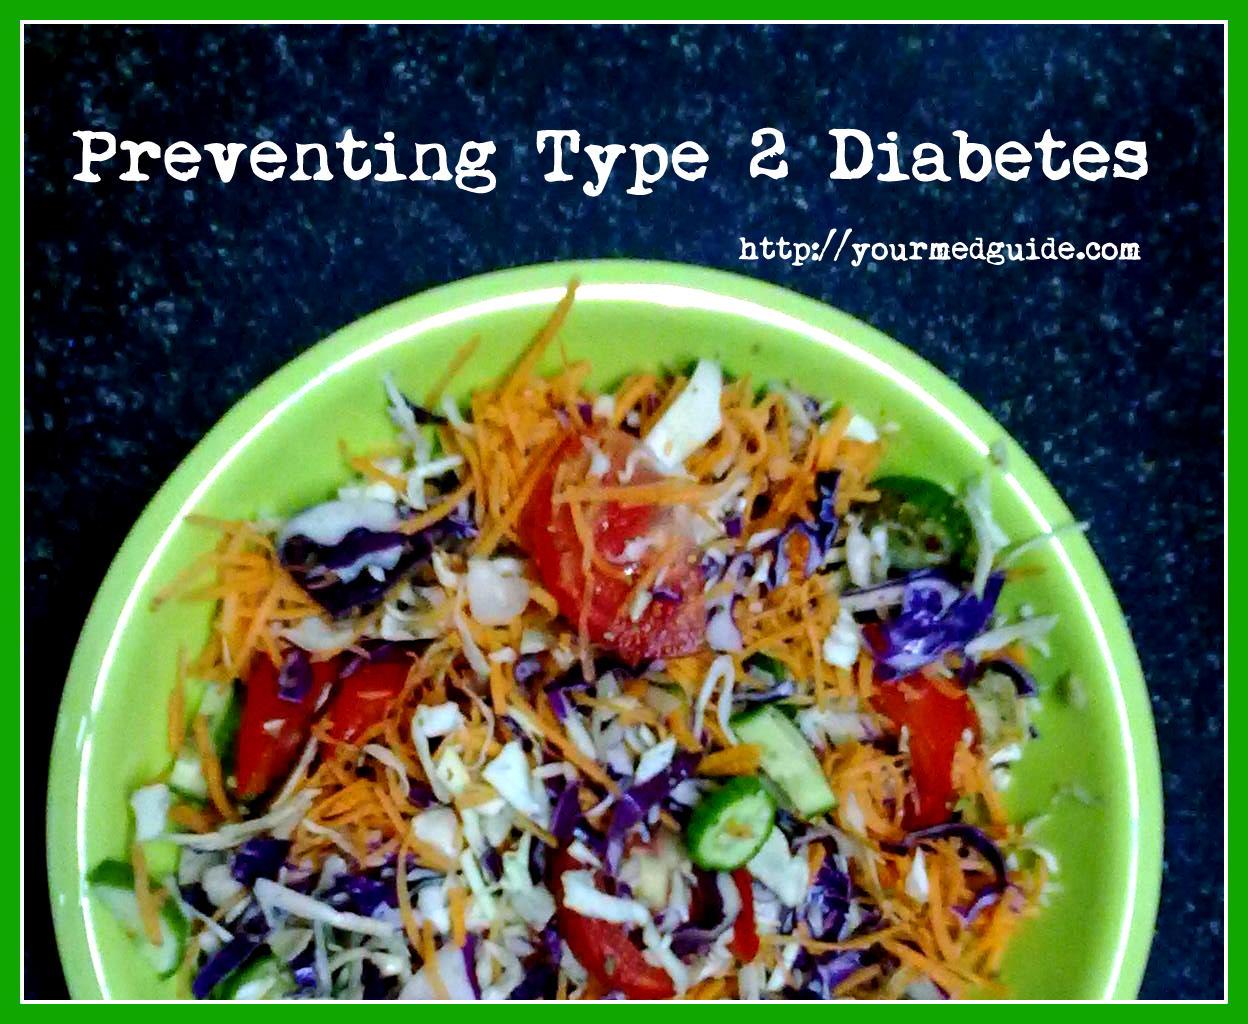 Preventing Type 2 diabetes